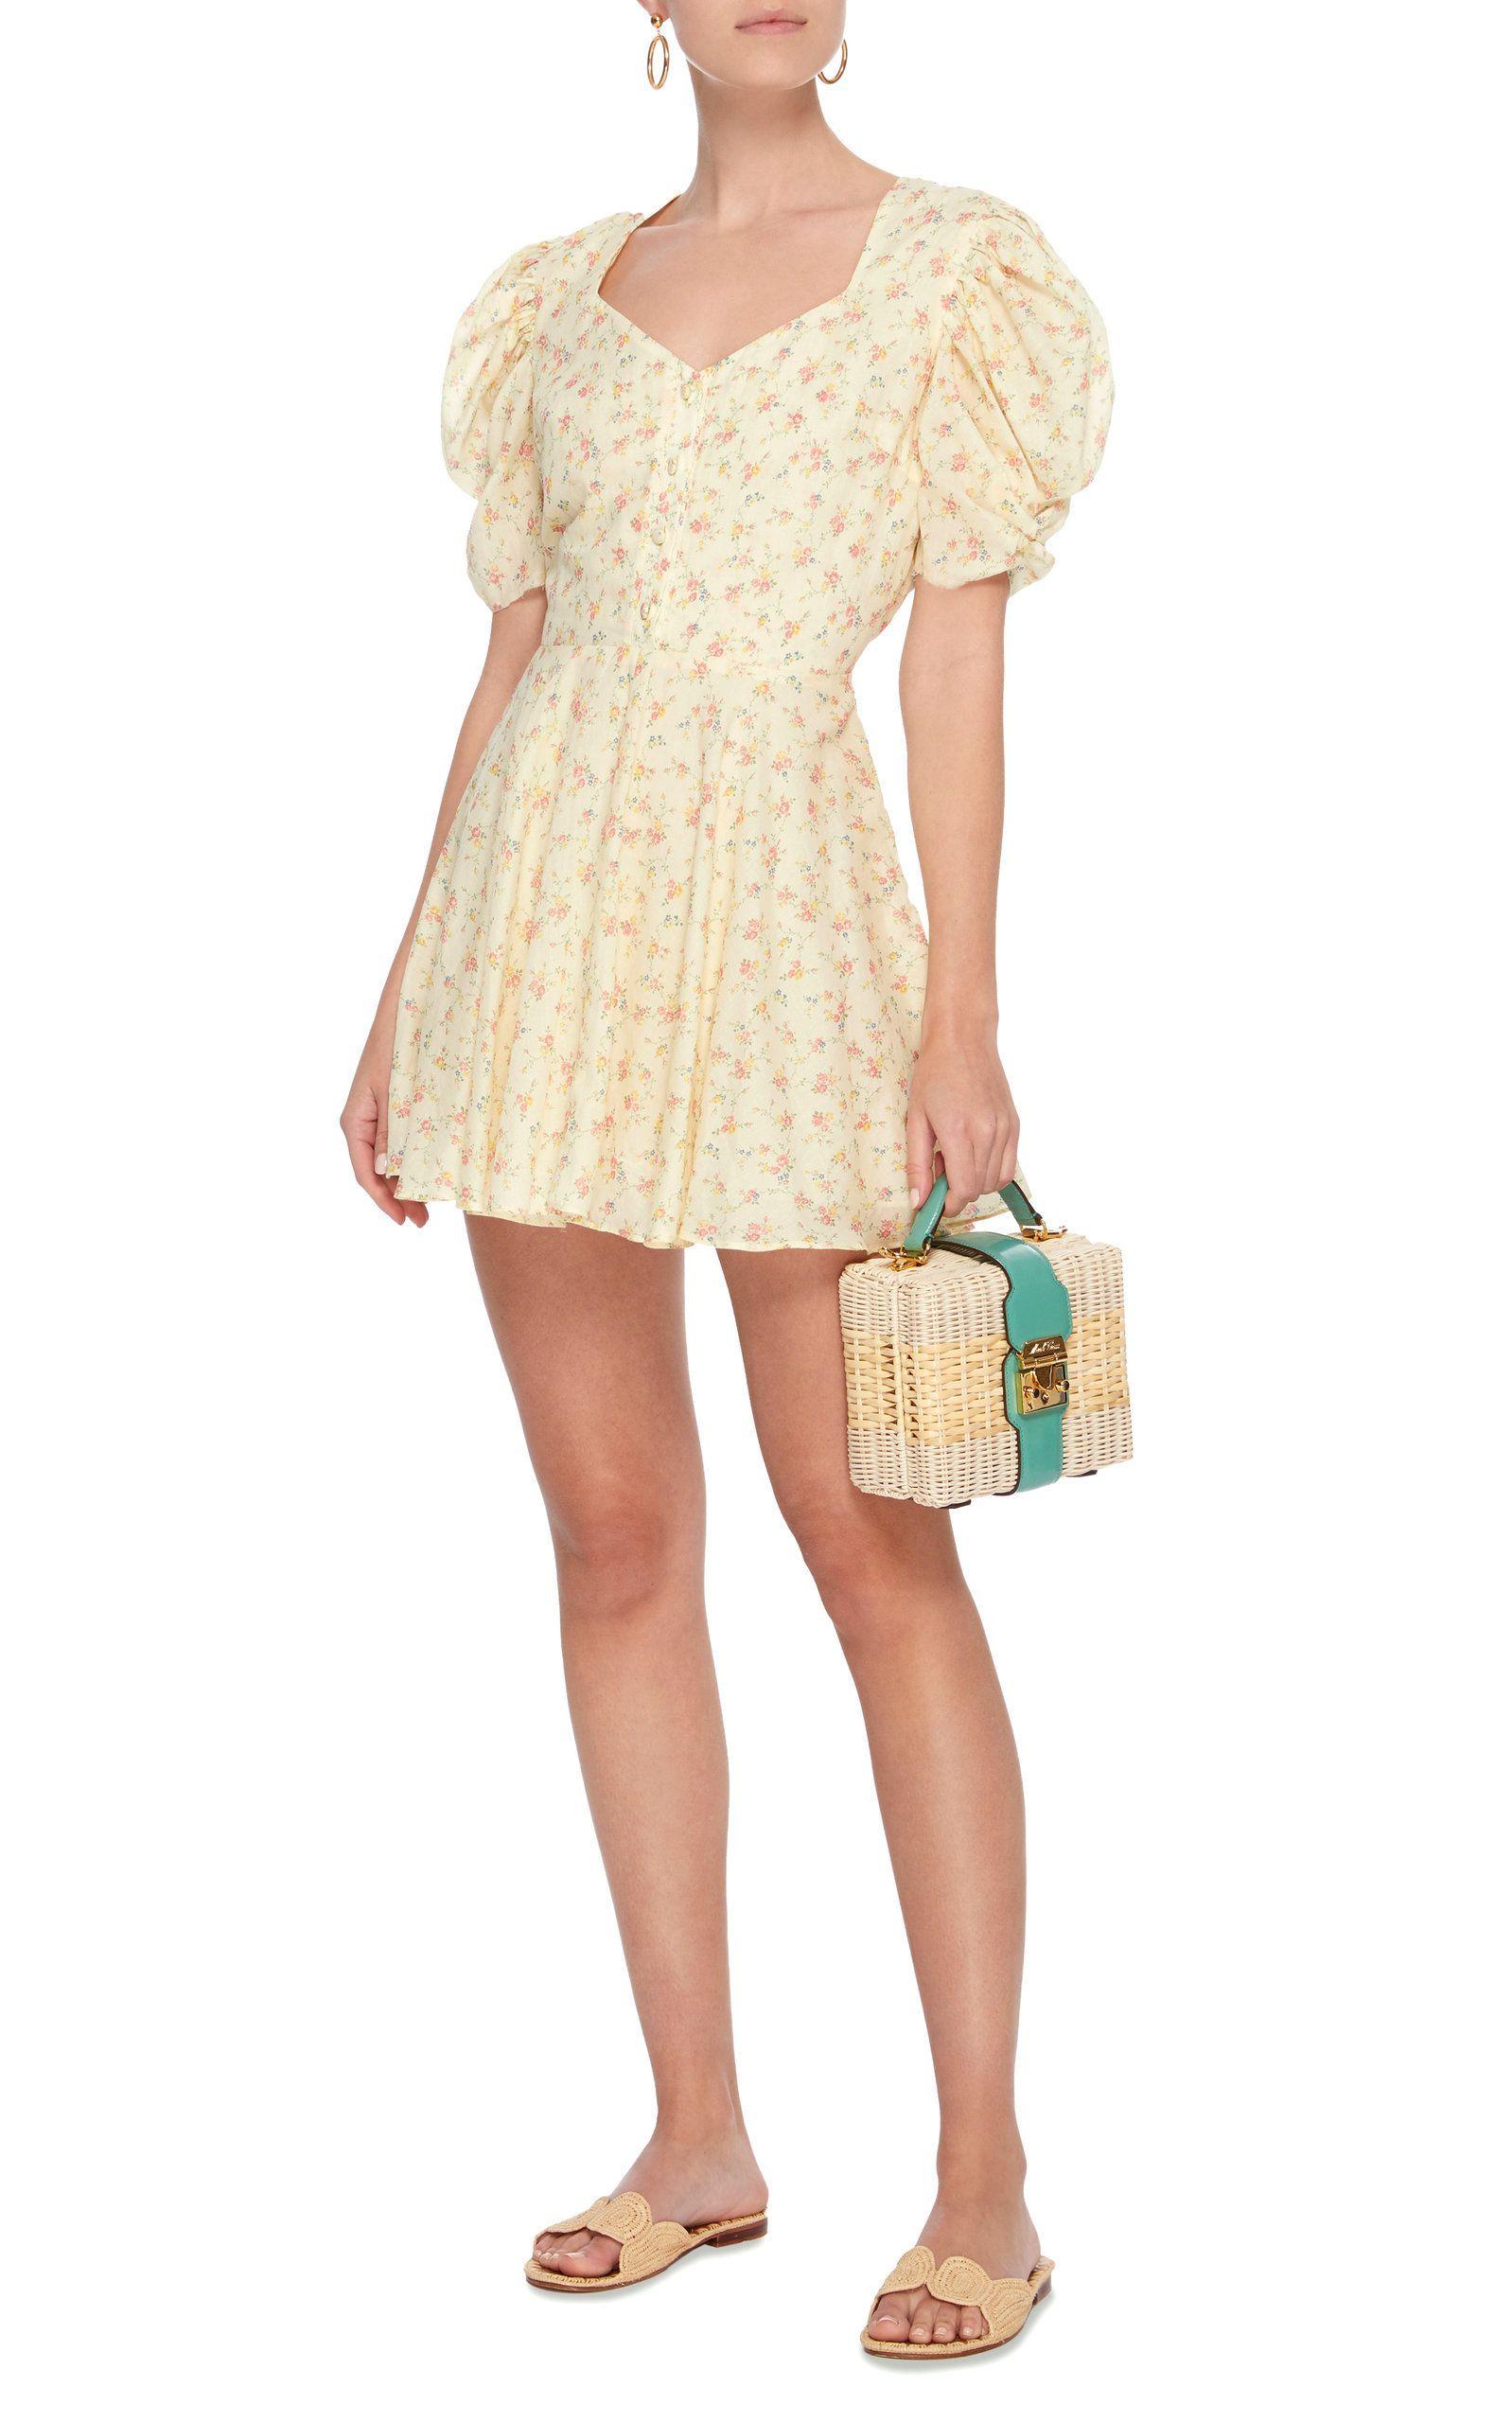 63589aaa0285 Cora Floral-Print Cotton Mini Dress | outfits f/w '17 | Dresses ...